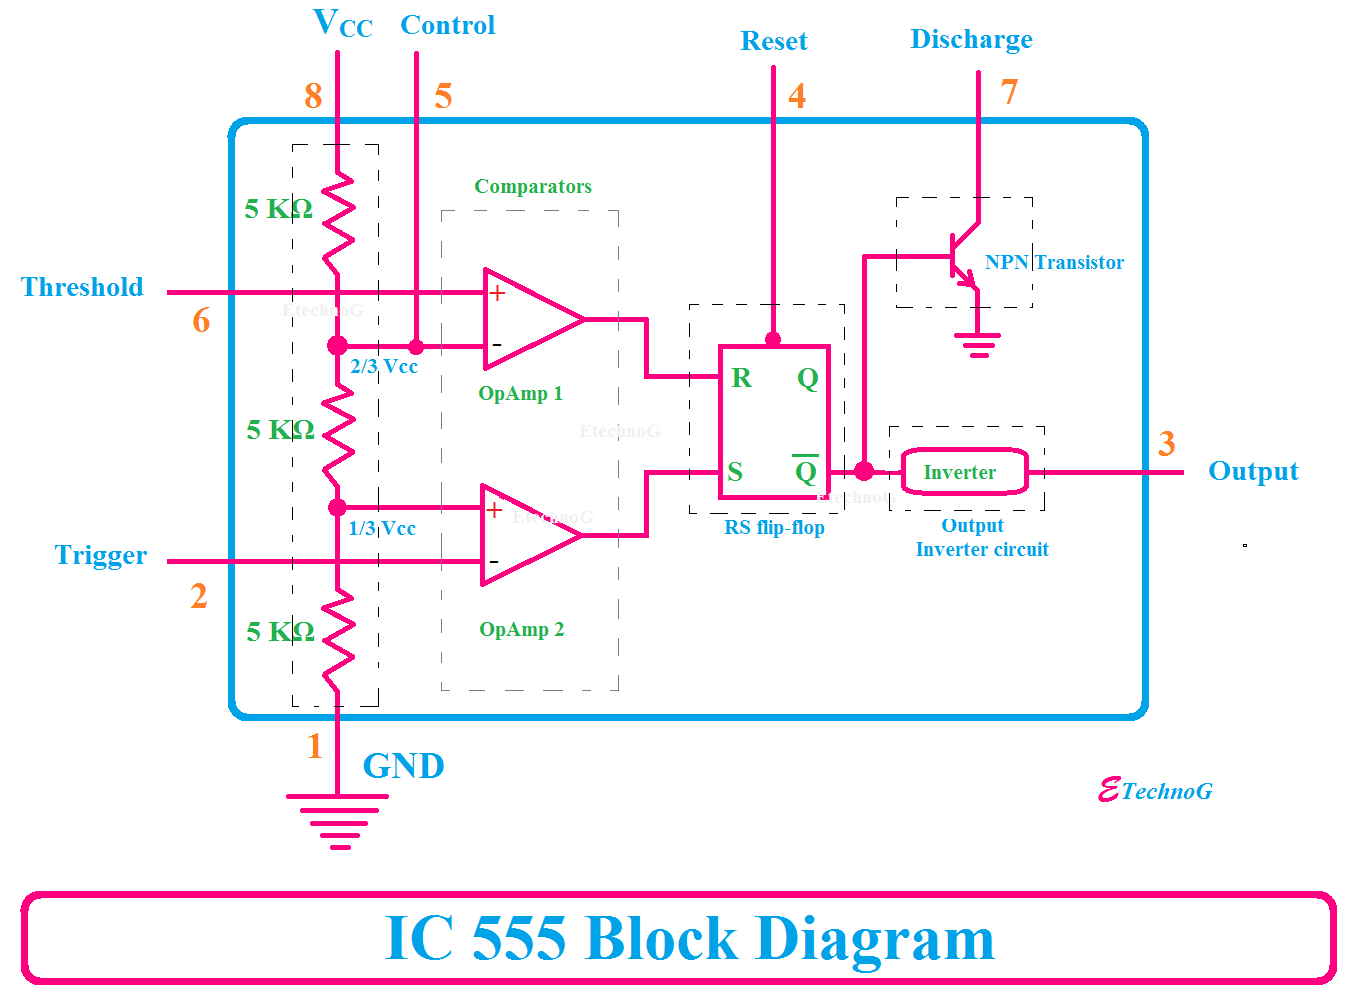 internal block diagram of ic 555 [ 1359 x 1001 Pixel ]